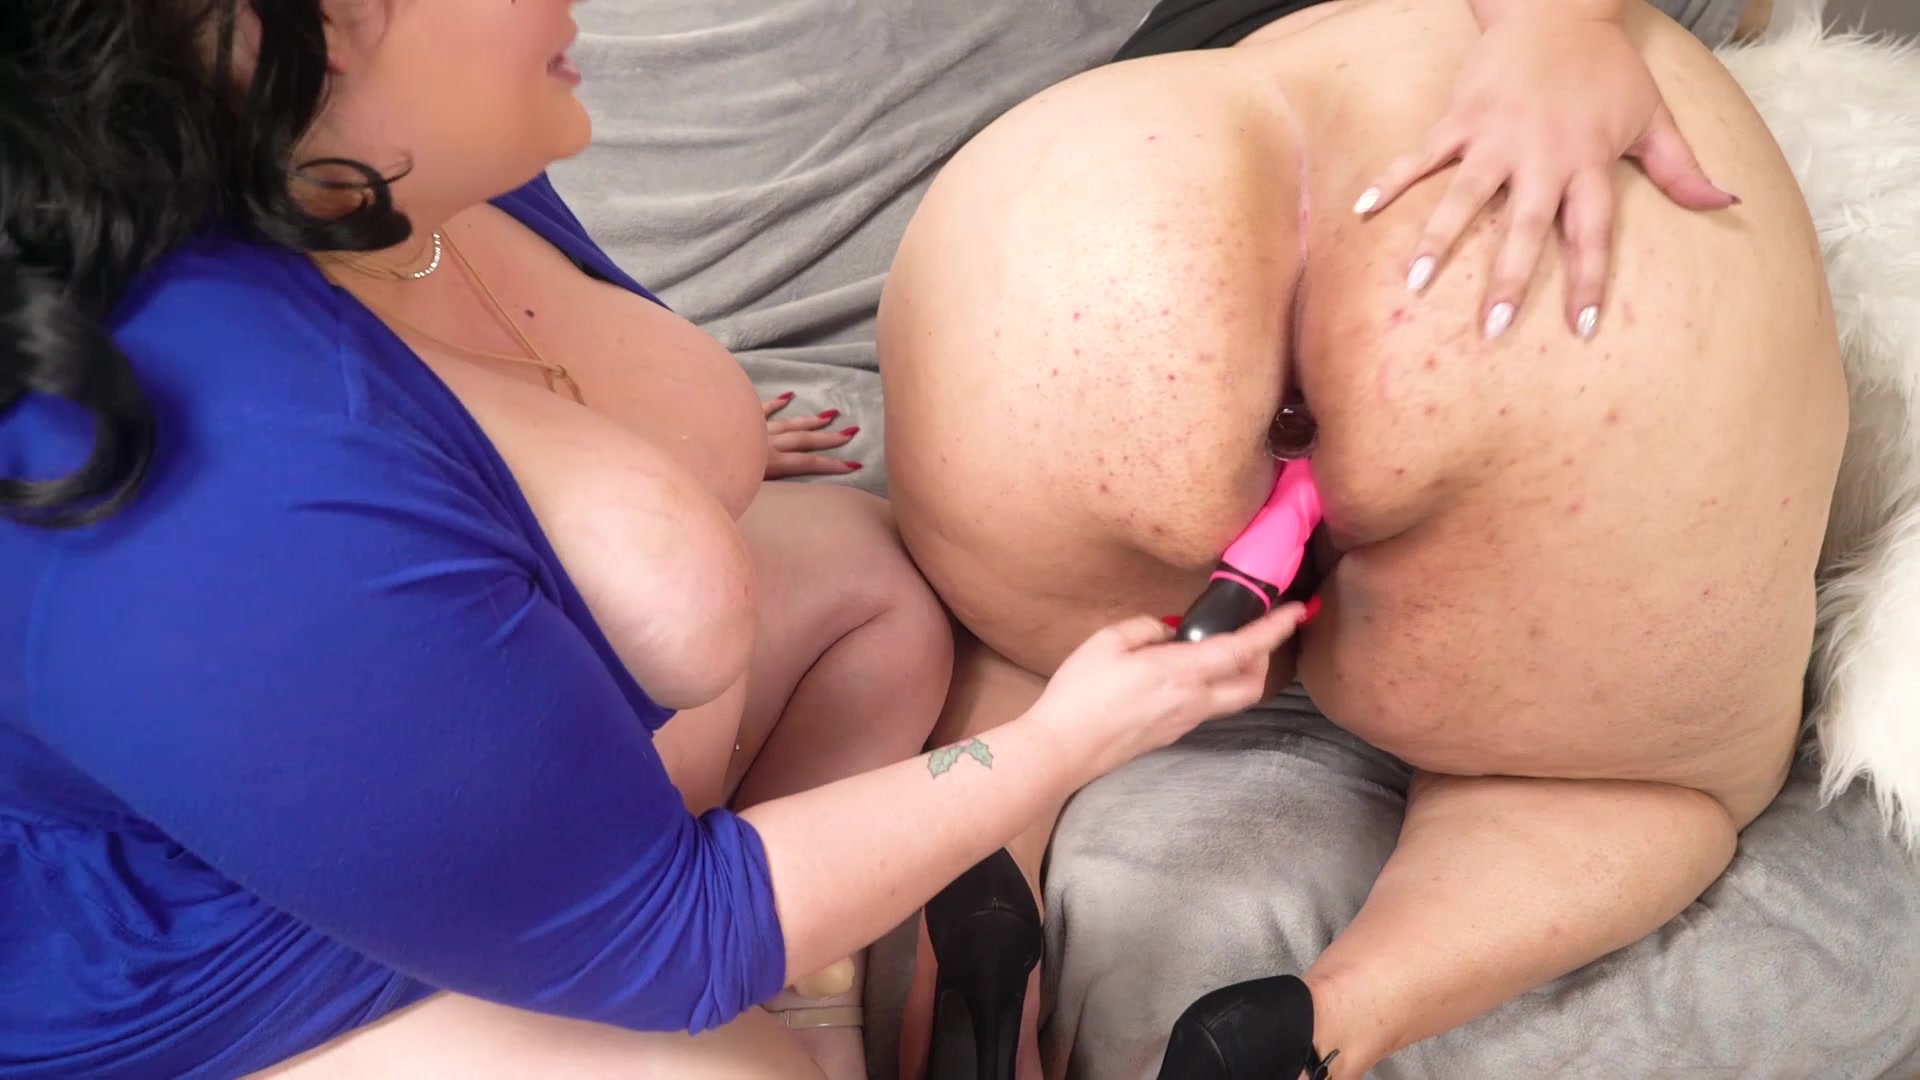 Dansk porno debut milf massage 1